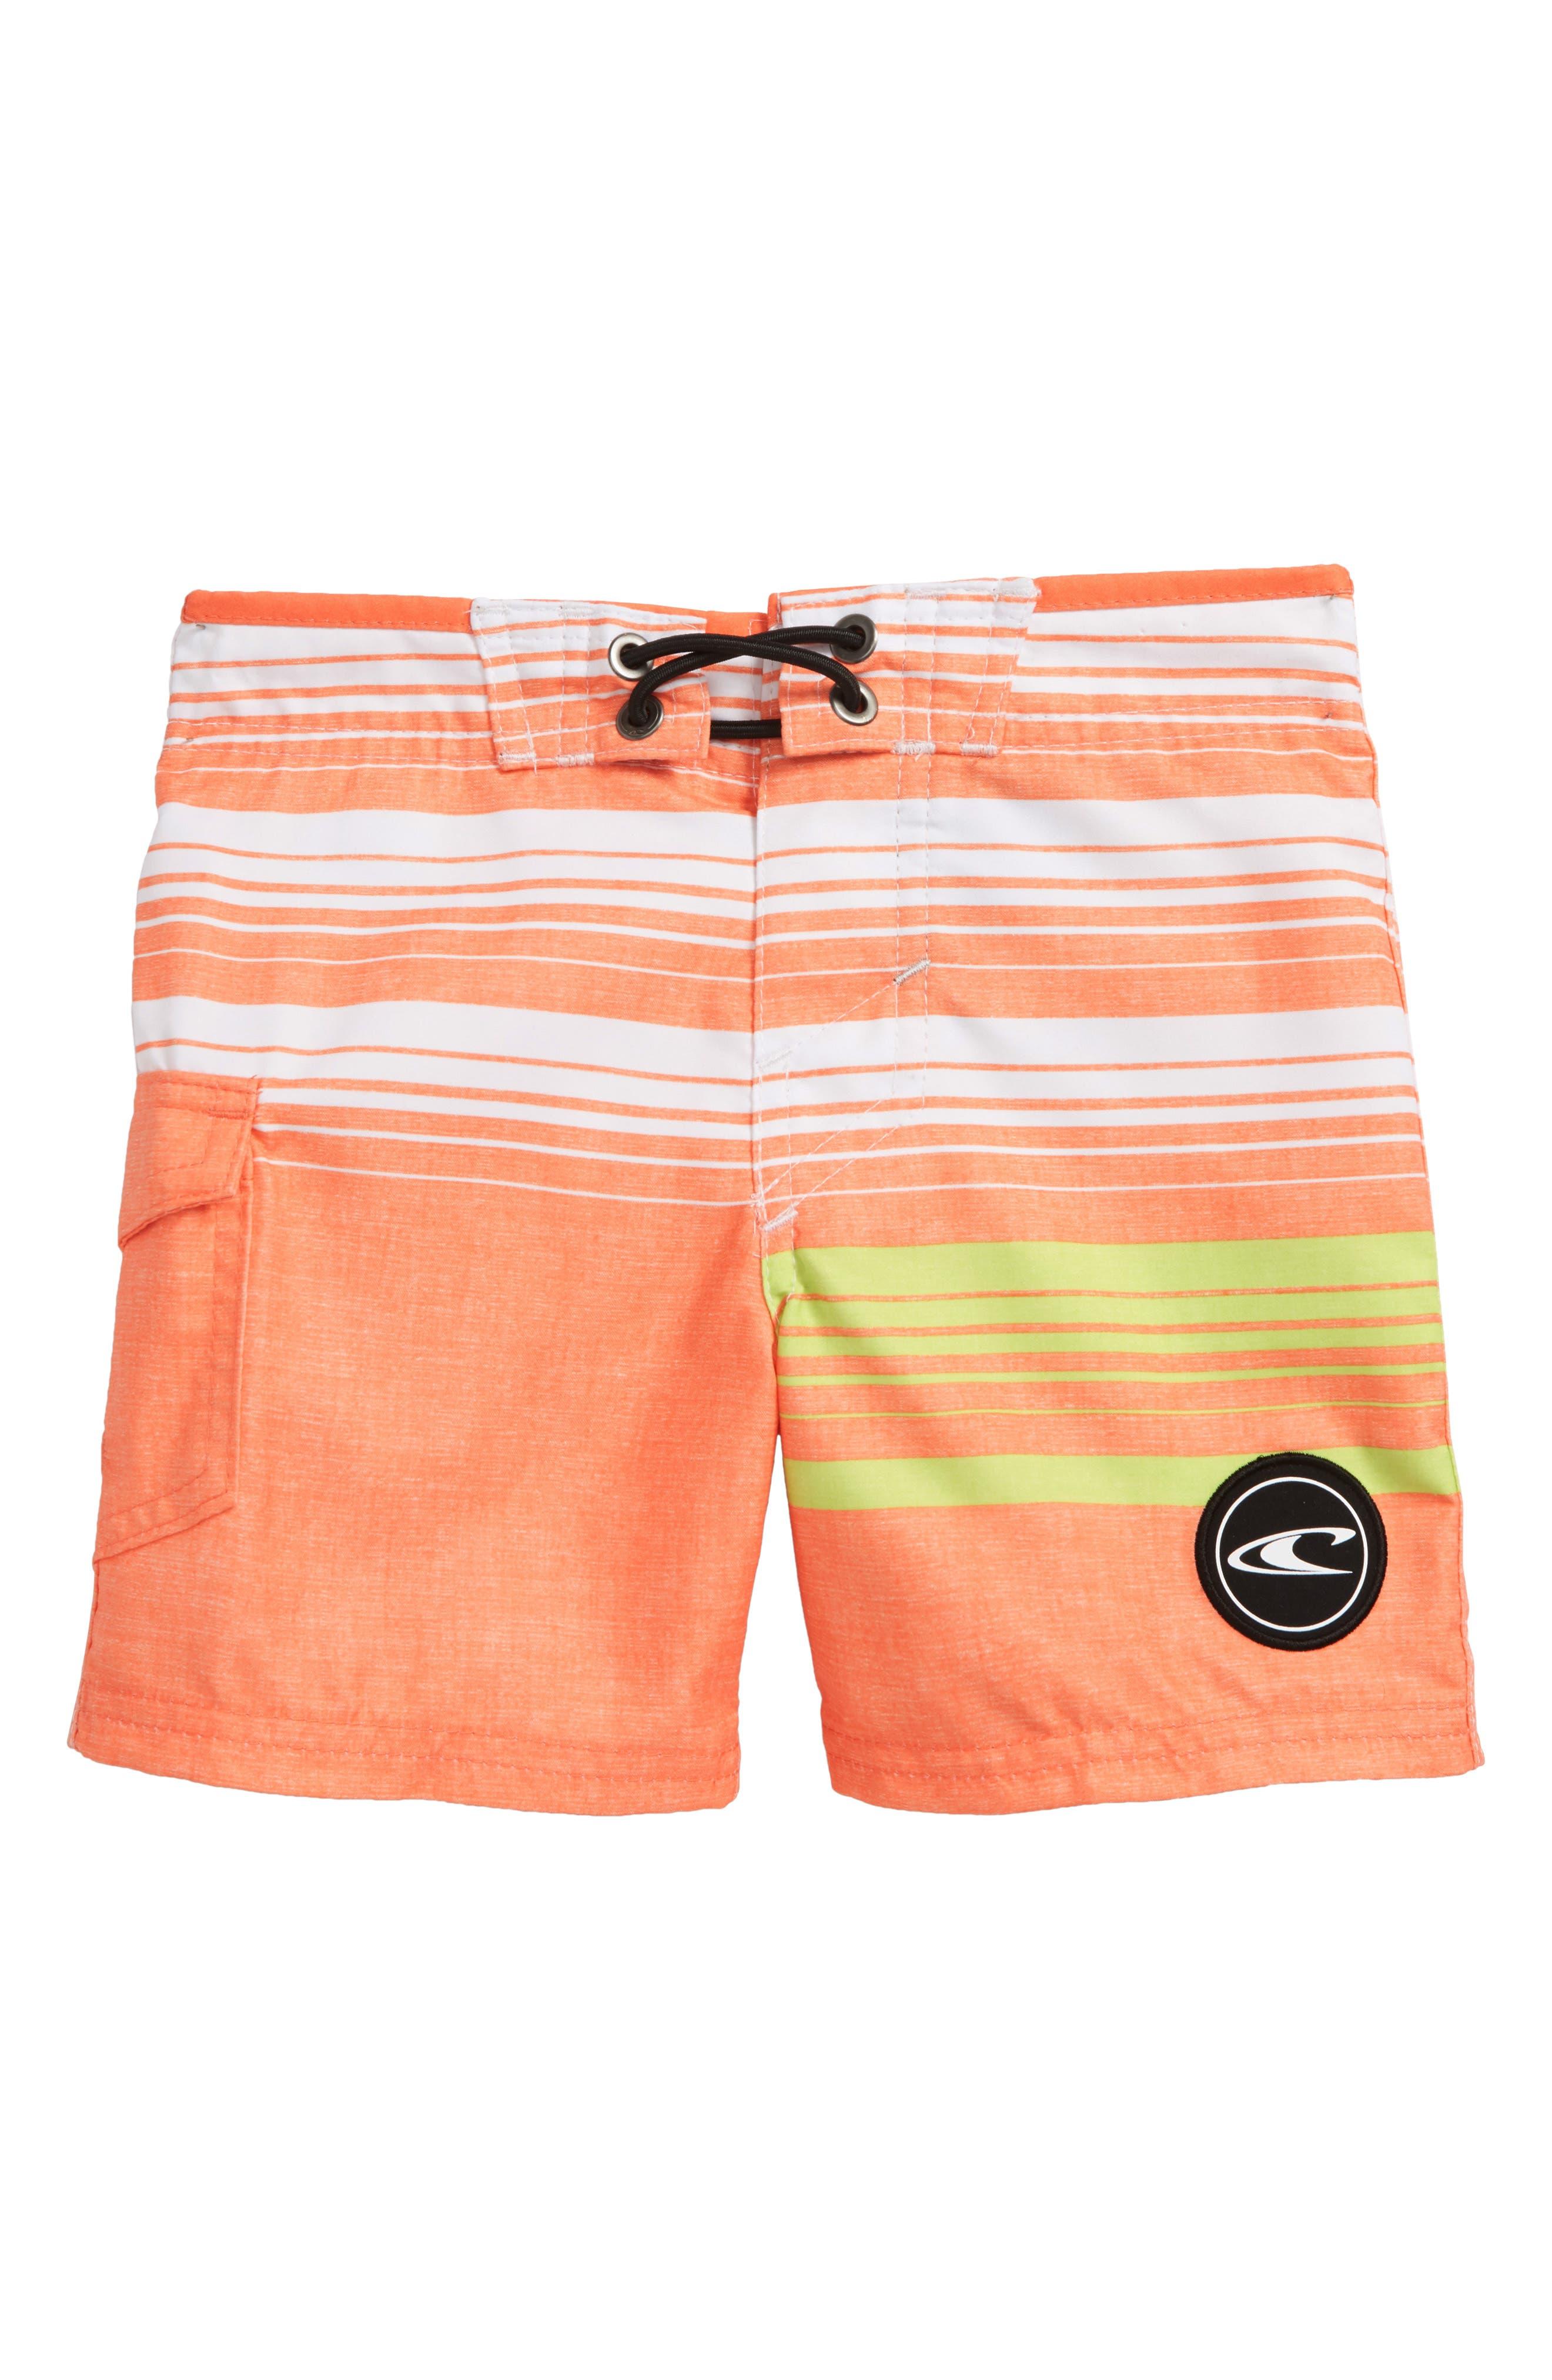 Bennett Board Shorts,                             Main thumbnail 1, color,                             Orange